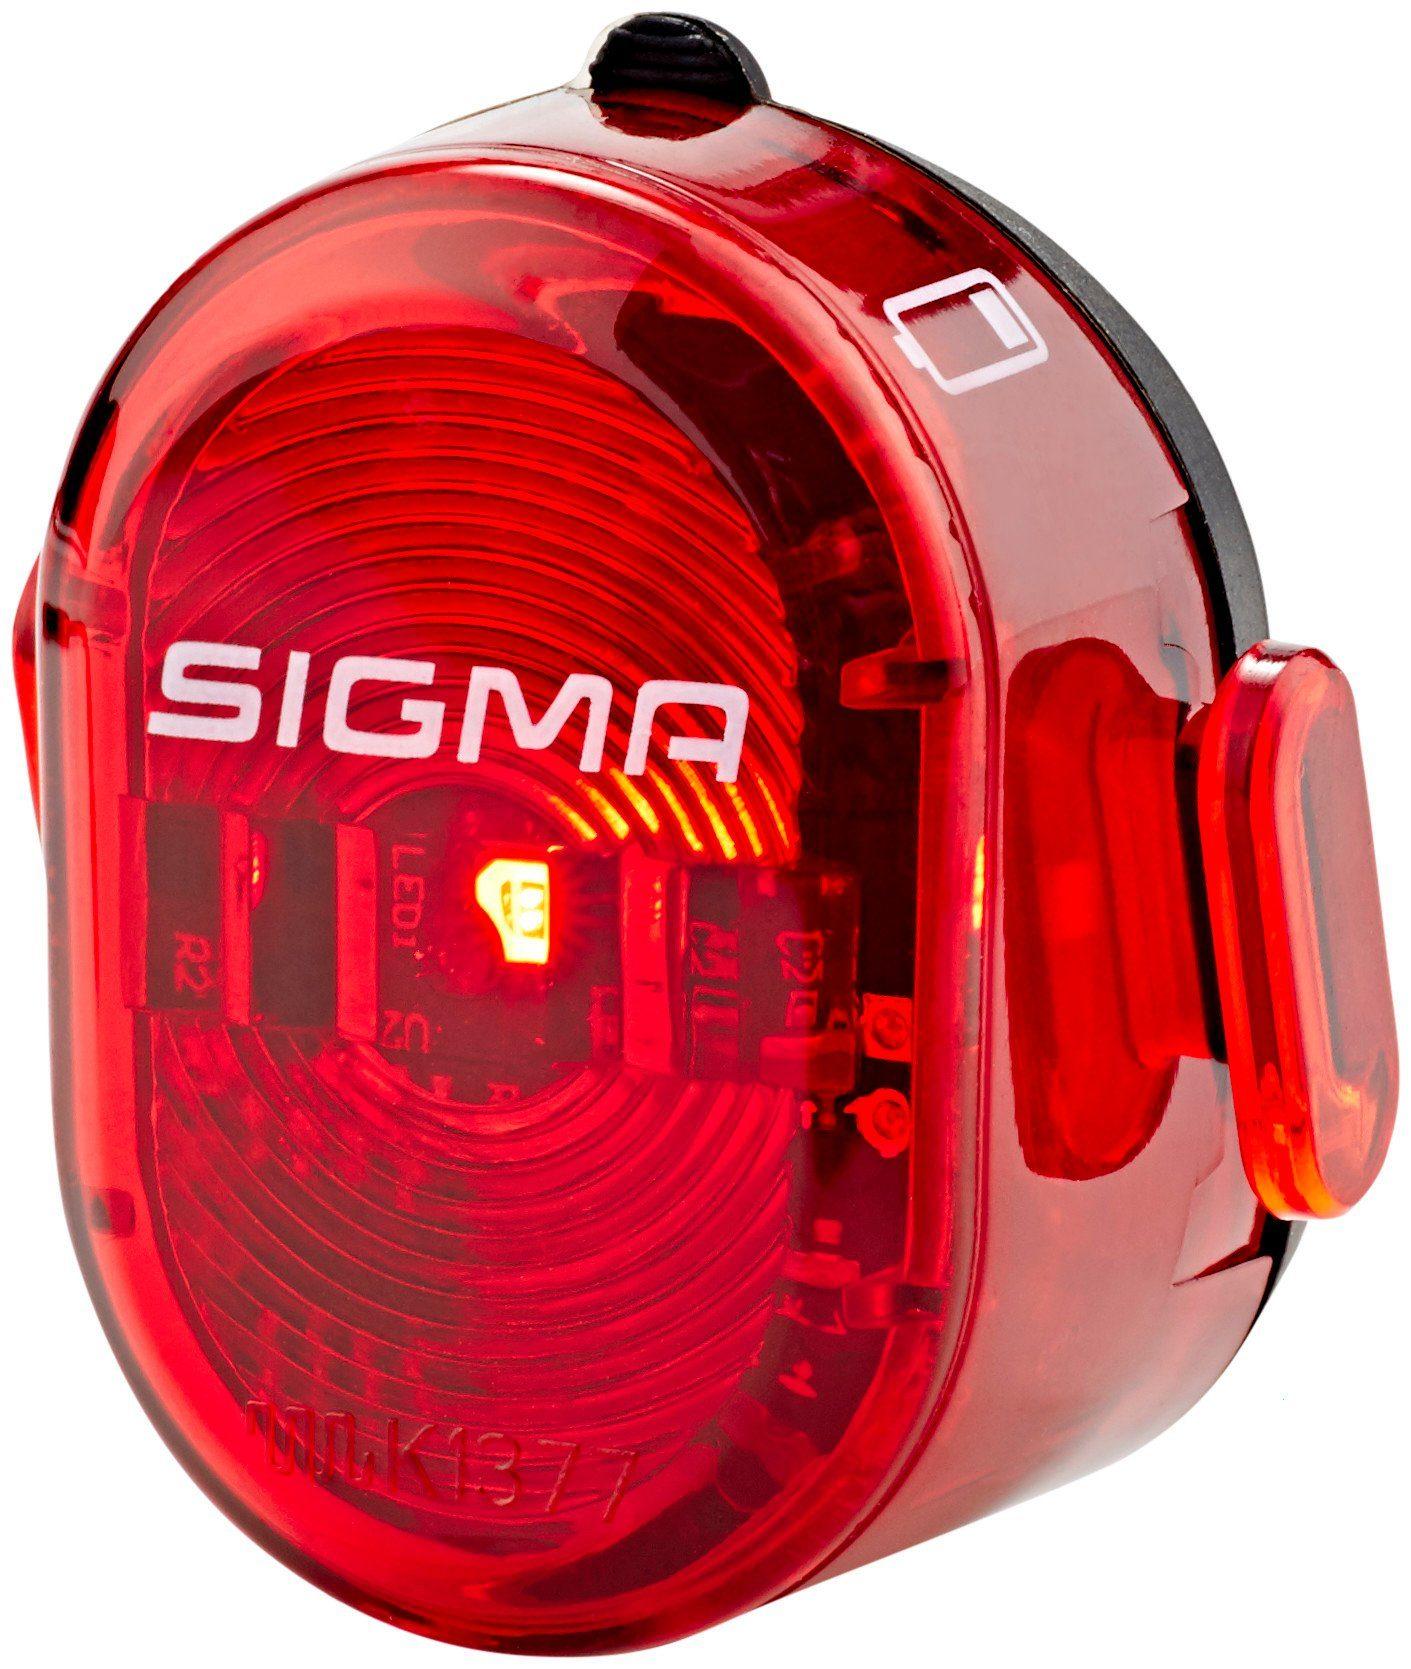 Sigma Sport Fahrradbeleuchtung »Nugget II Rücklicht«